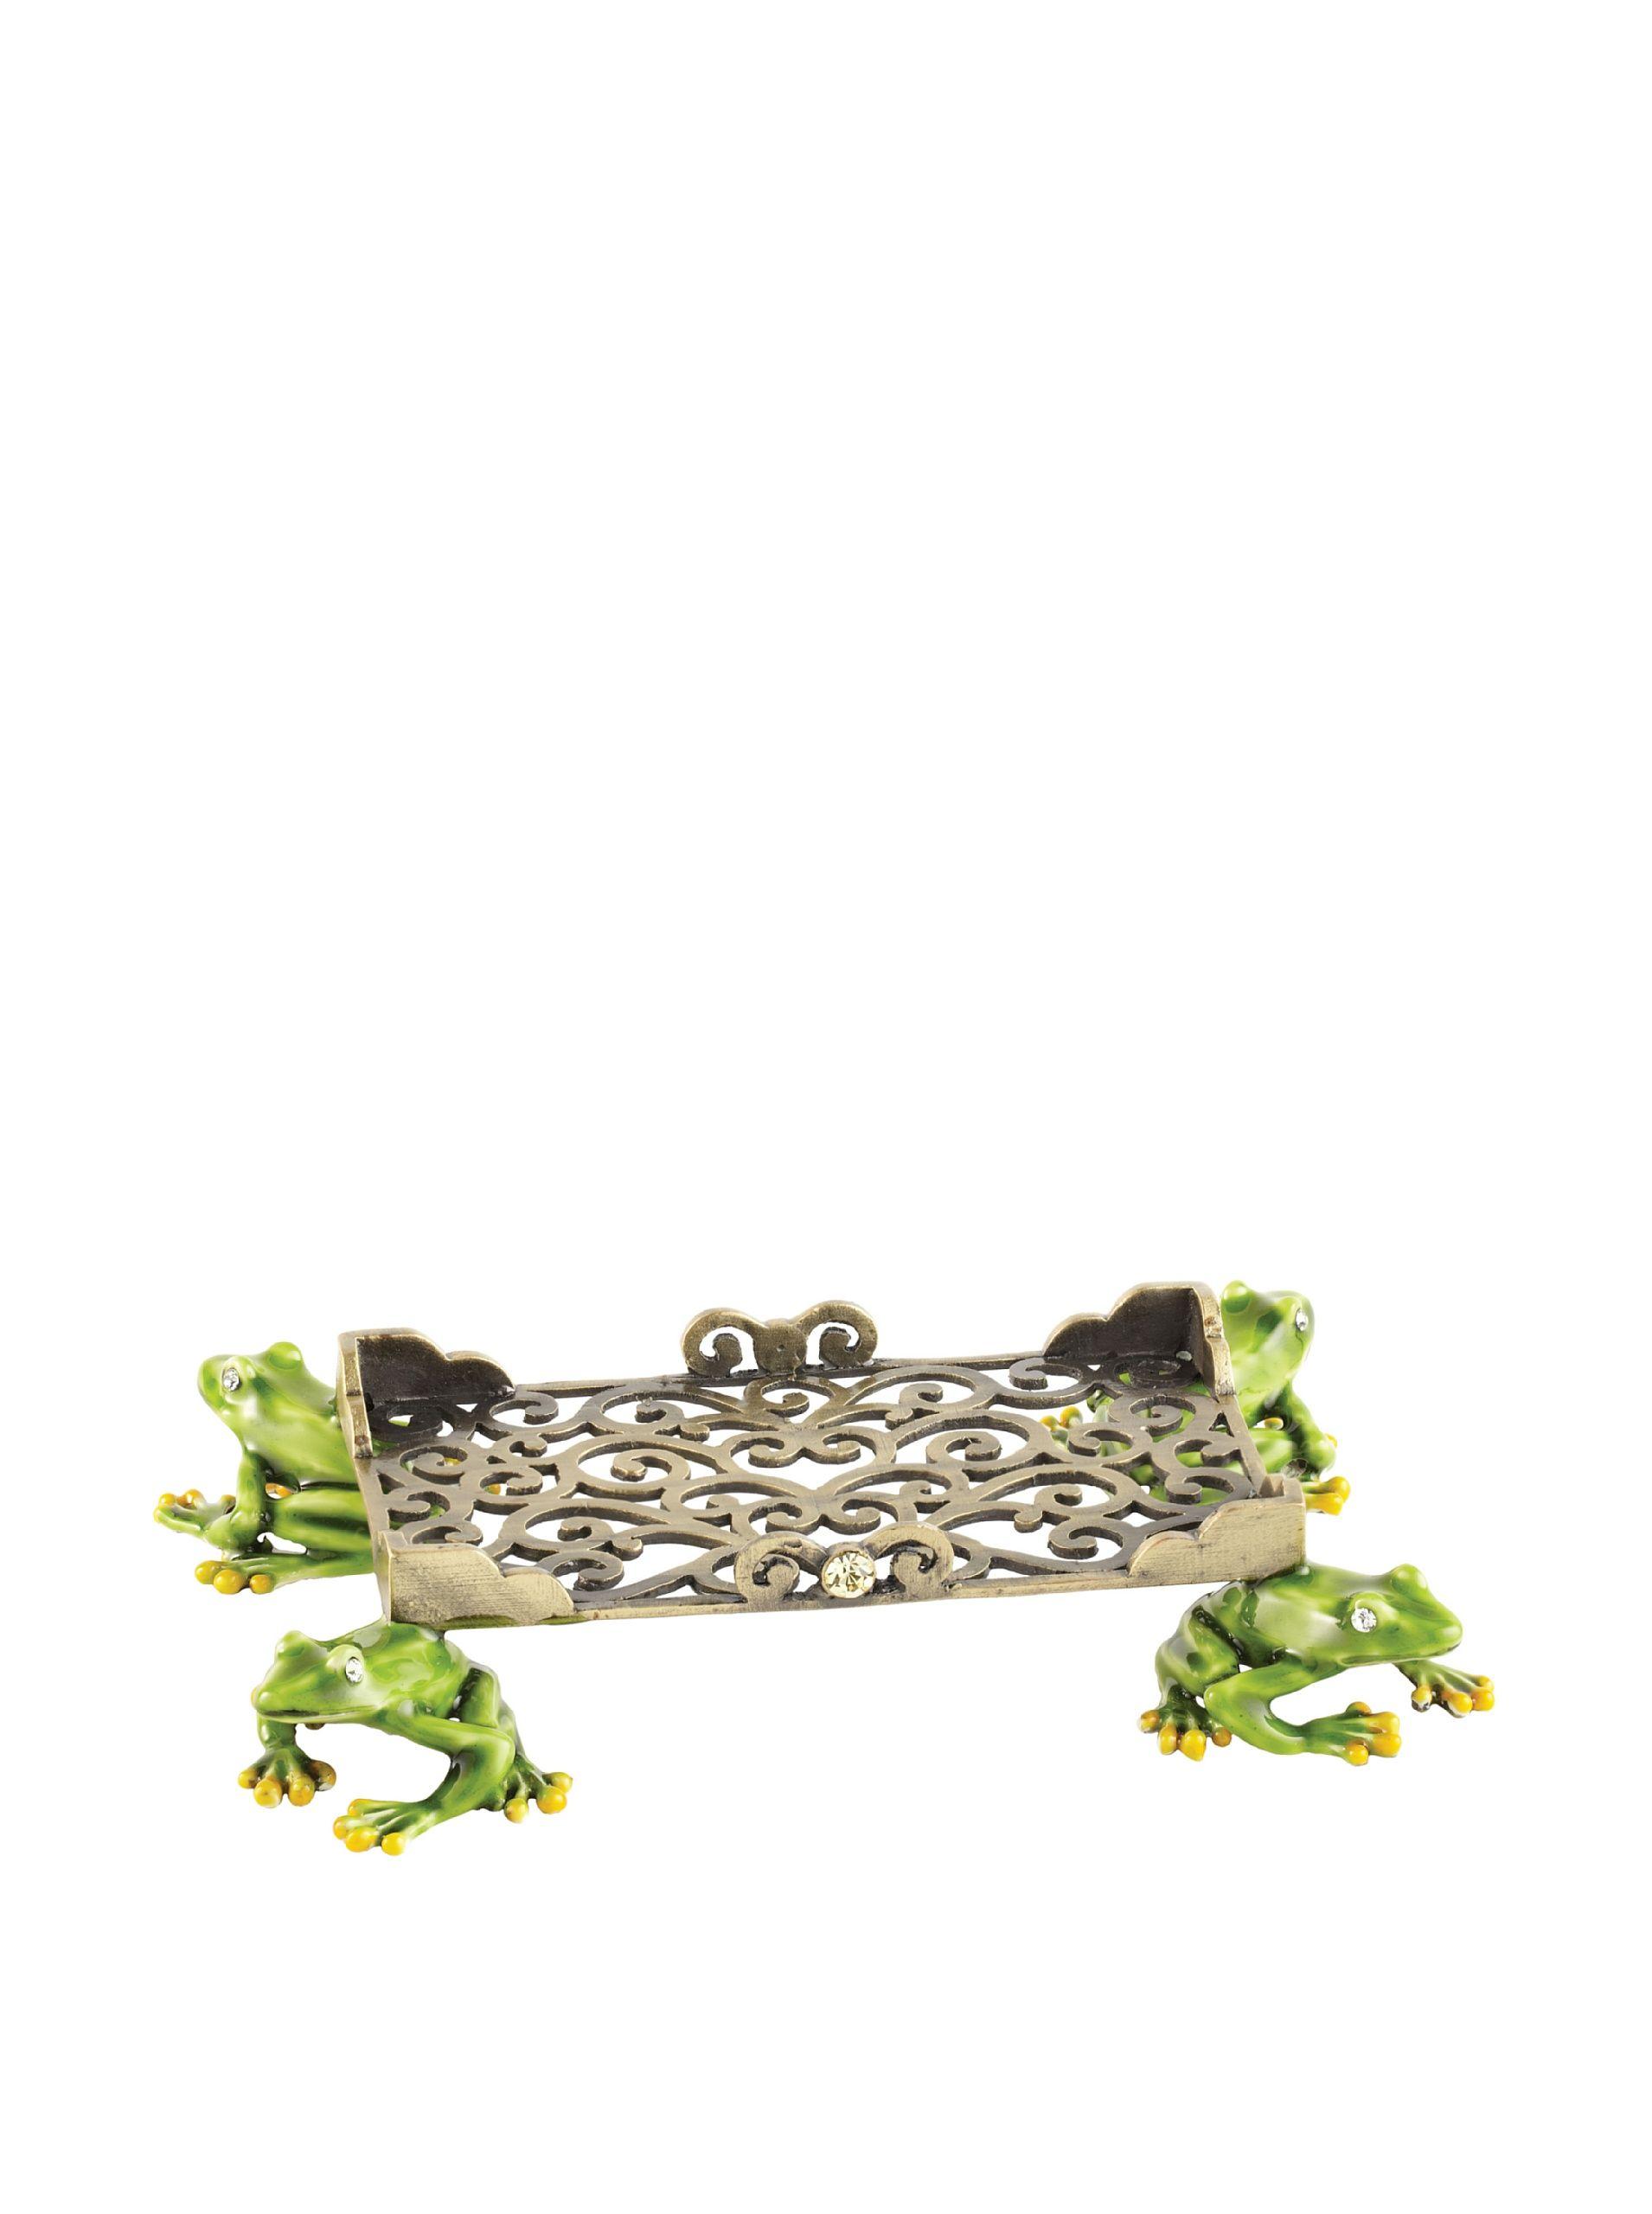 Olivia riegel swarovski encrusted frog business card holder cast olivia riegel swarovski encrusted frog business card holder cast pewter with intricate hand enameling and colourmoves